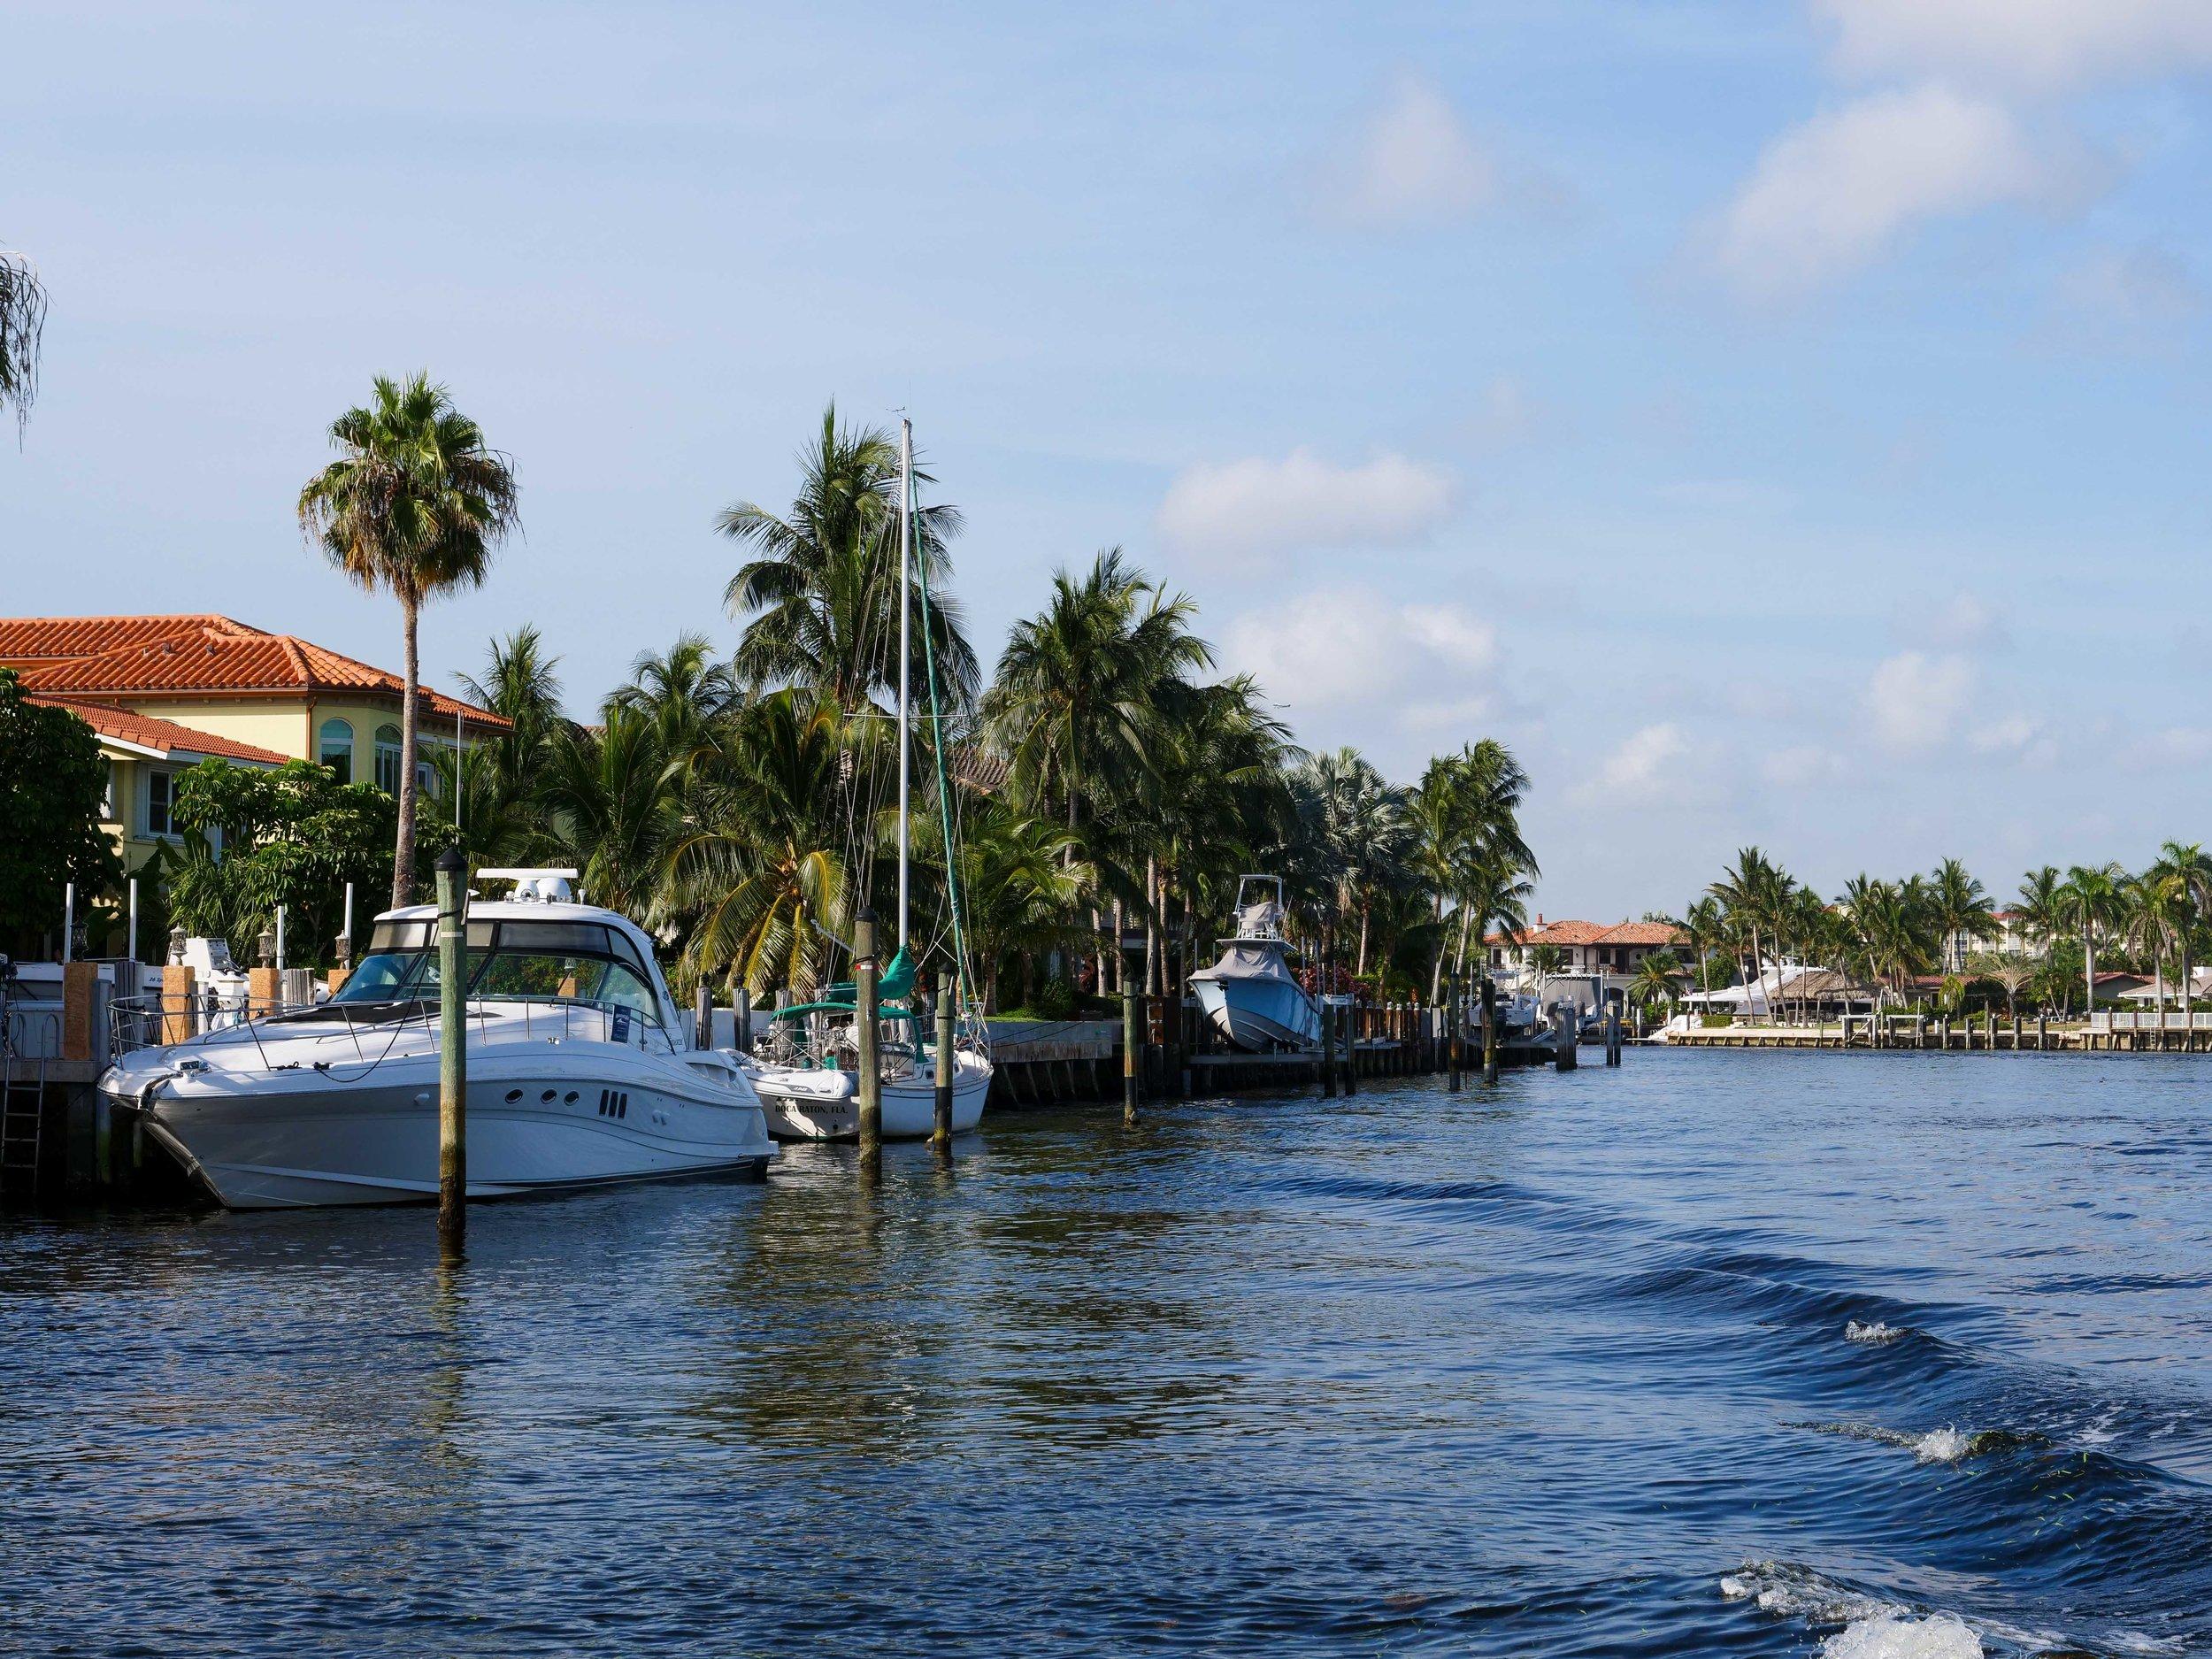 Yacht's docked along Millionaire's Row